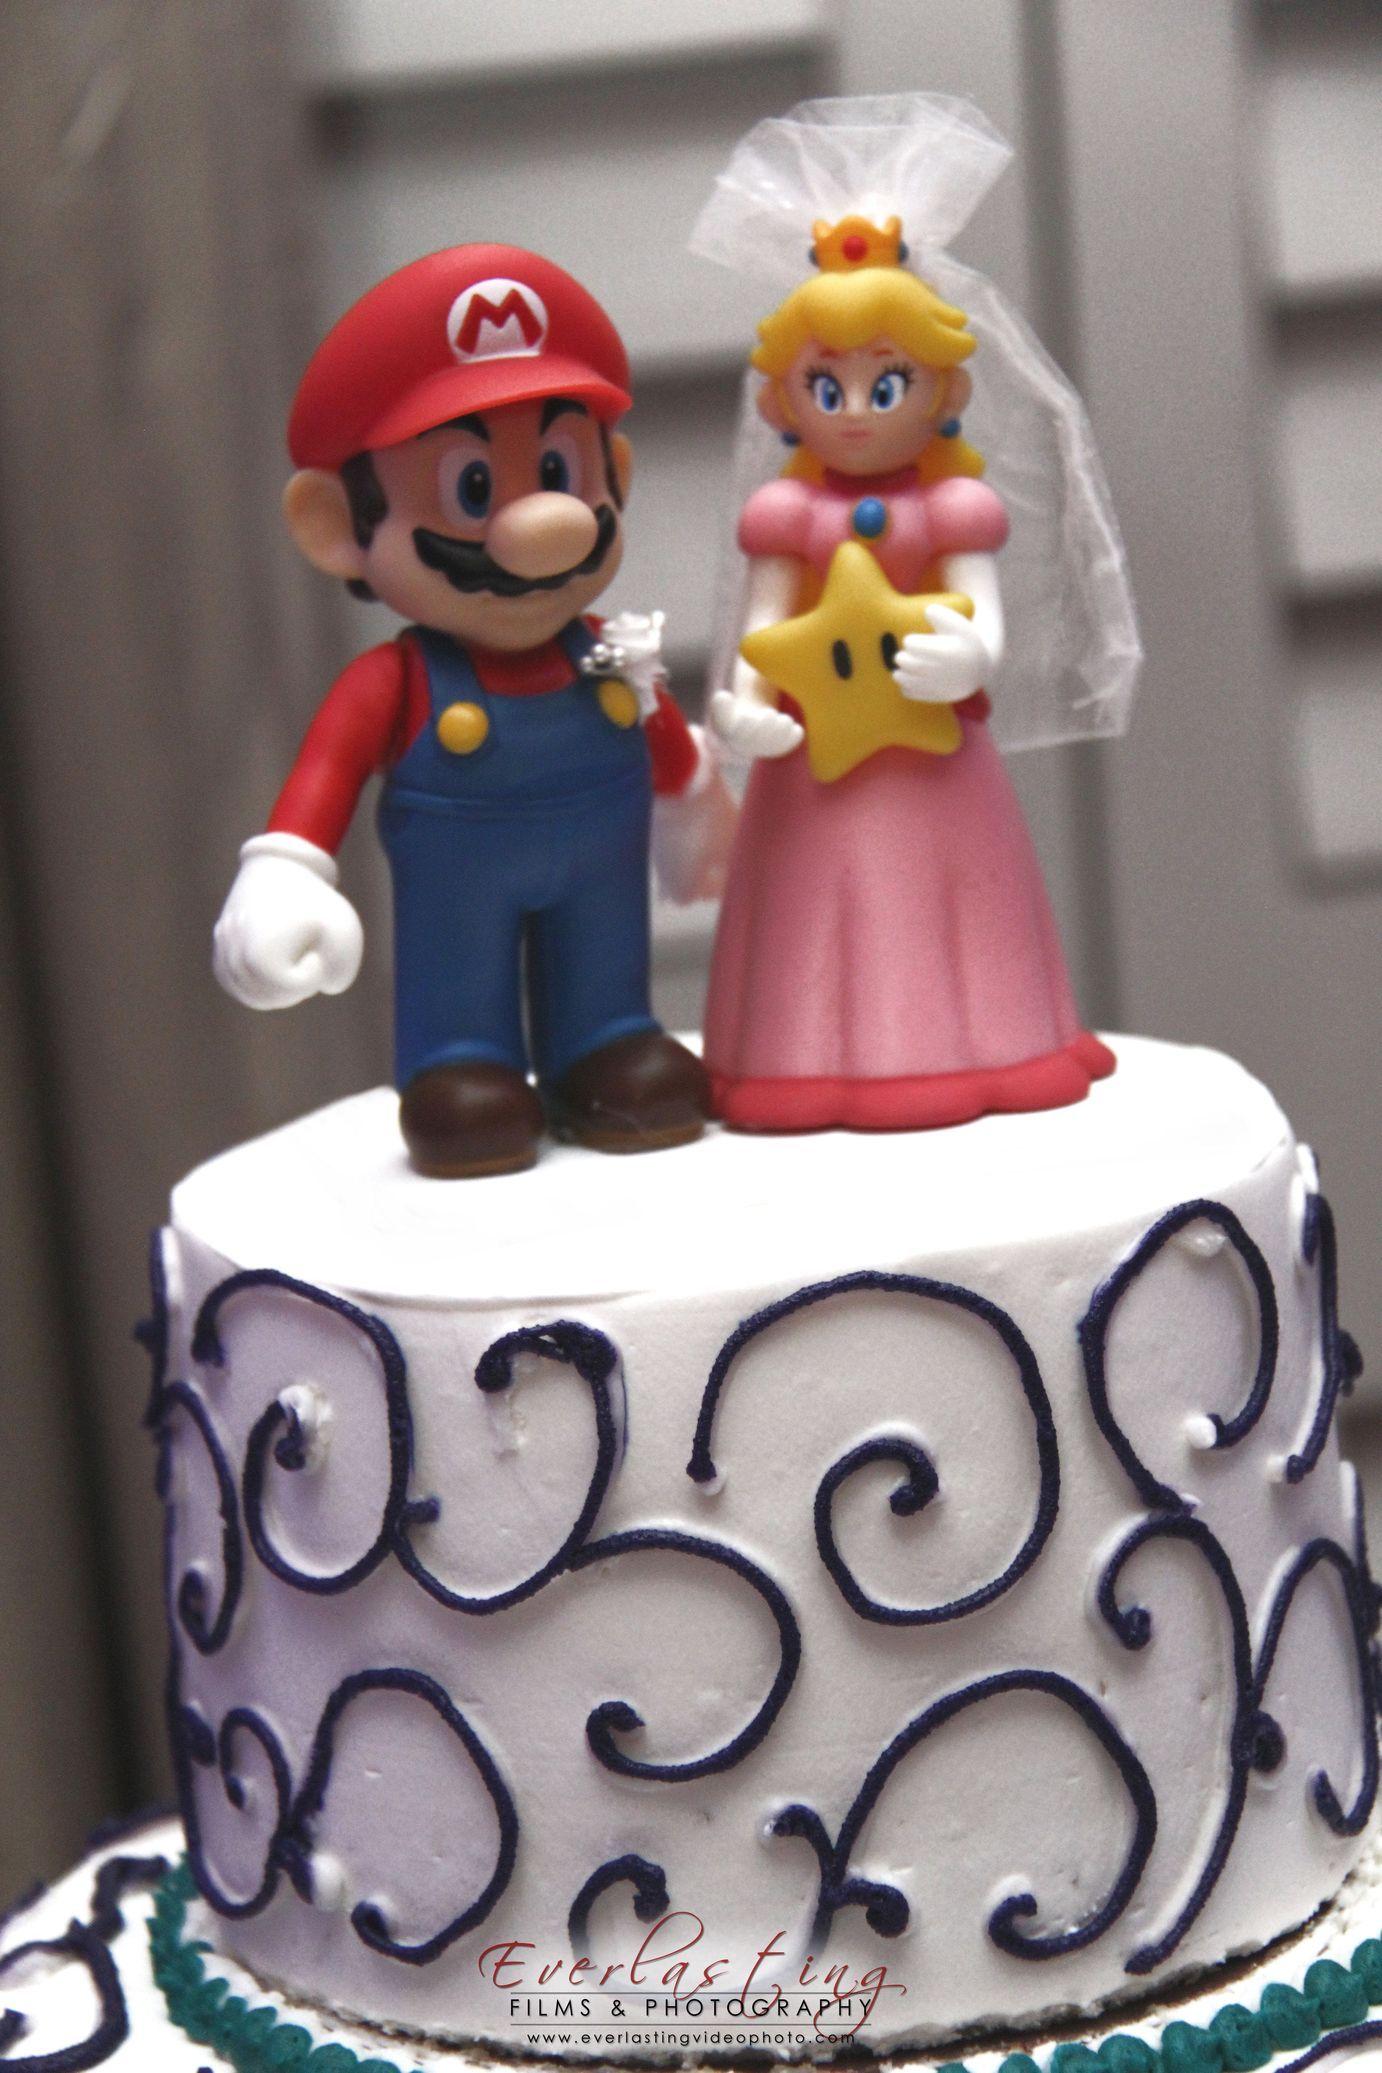 DIY Super Mario & Princess Peach cake topper | Mario Stuff ...